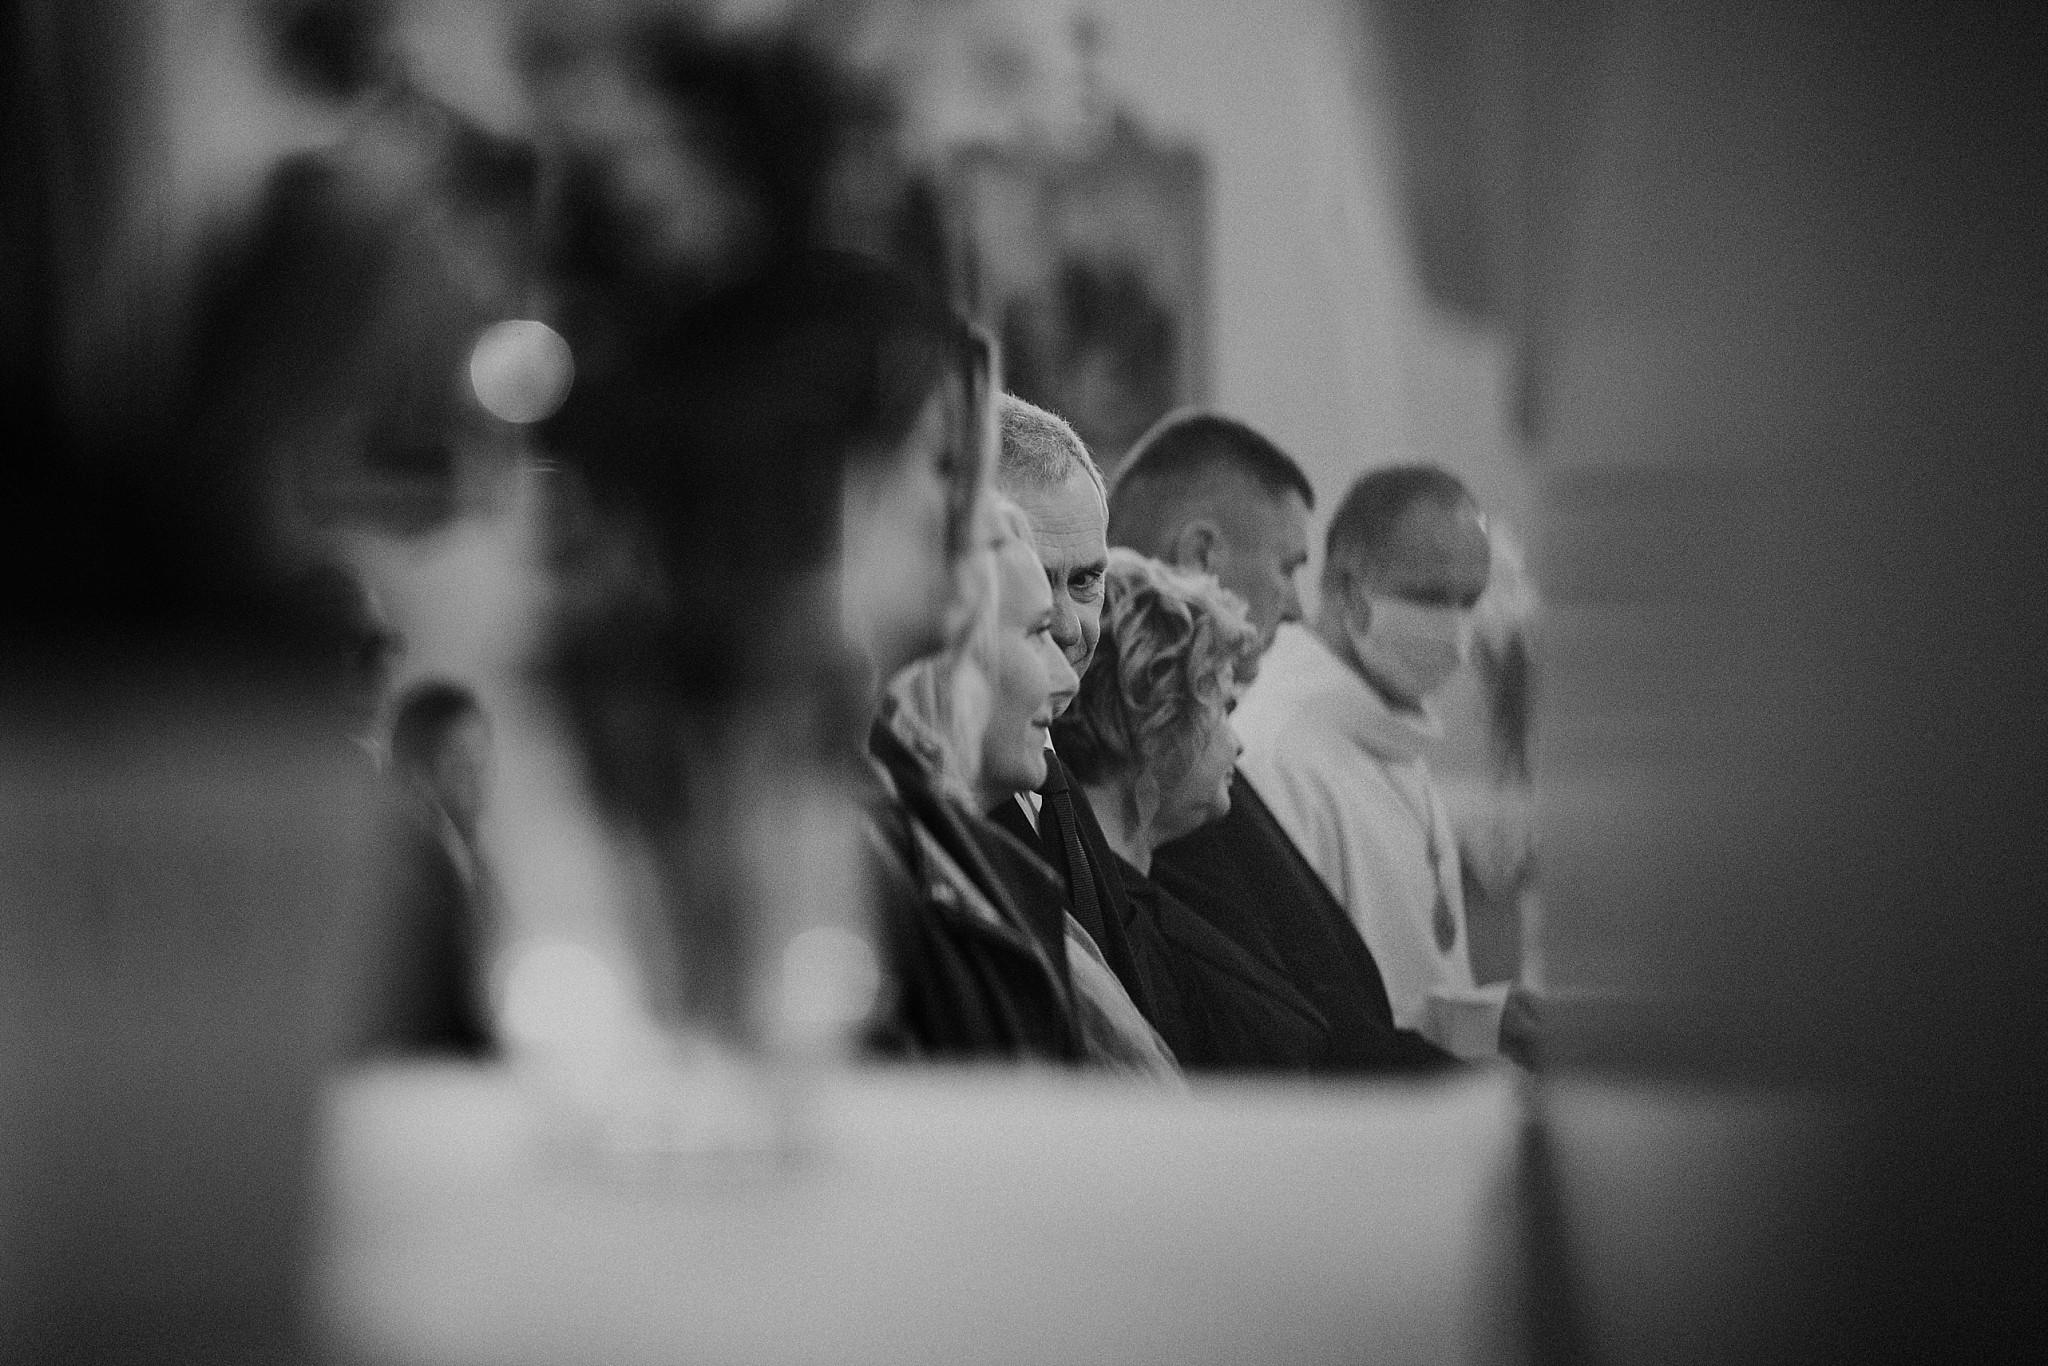 fotograf poznan wesele dobra truskawka piekne wesele pod poznaniem wesele w dobrej truskawce piekna para mloda slub marzen slub koronawirus slub listopad wesele koronawirus 189